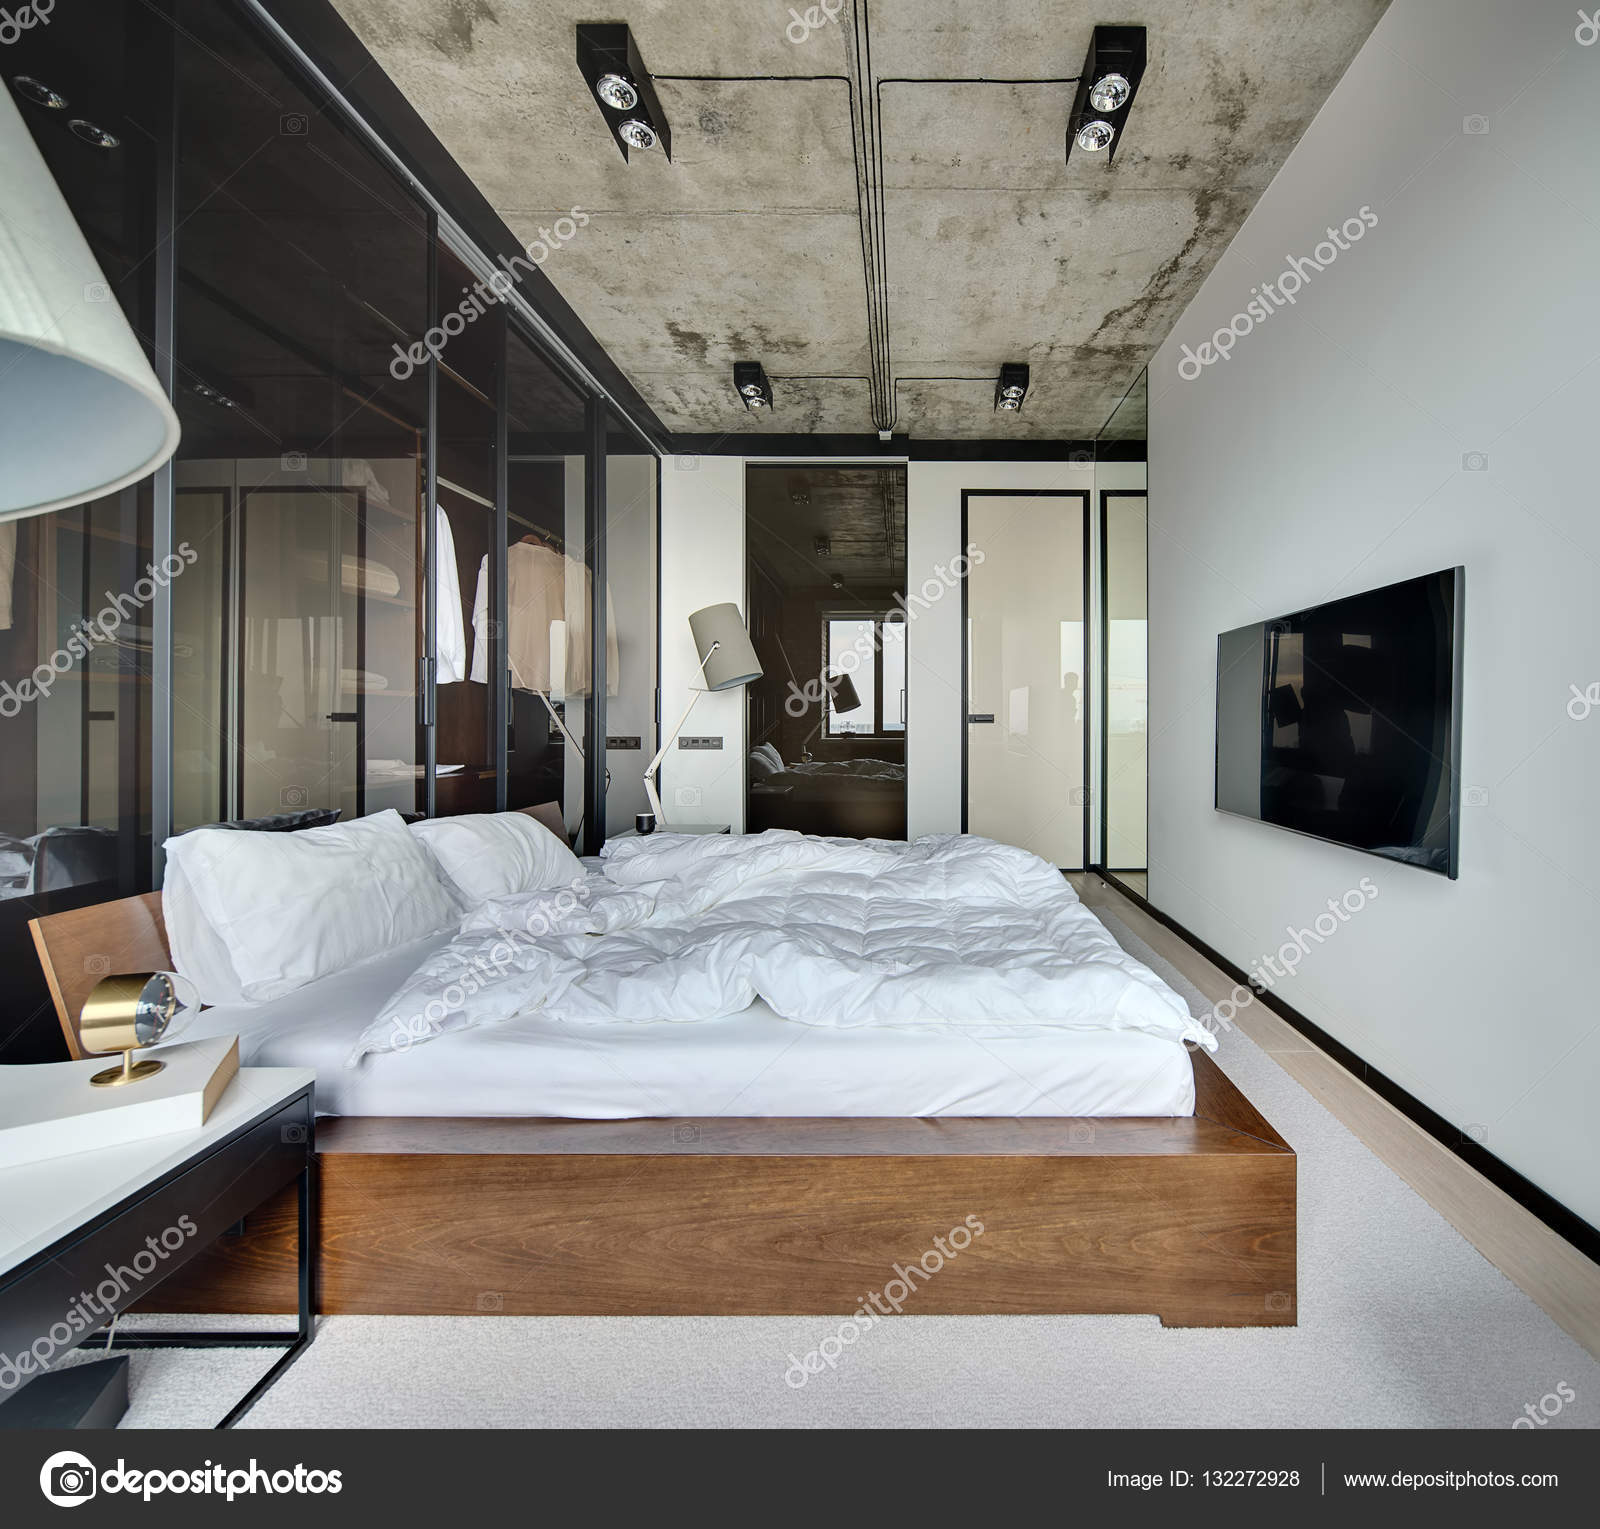 frais chambre loft. Black Bedroom Furniture Sets. Home Design Ideas